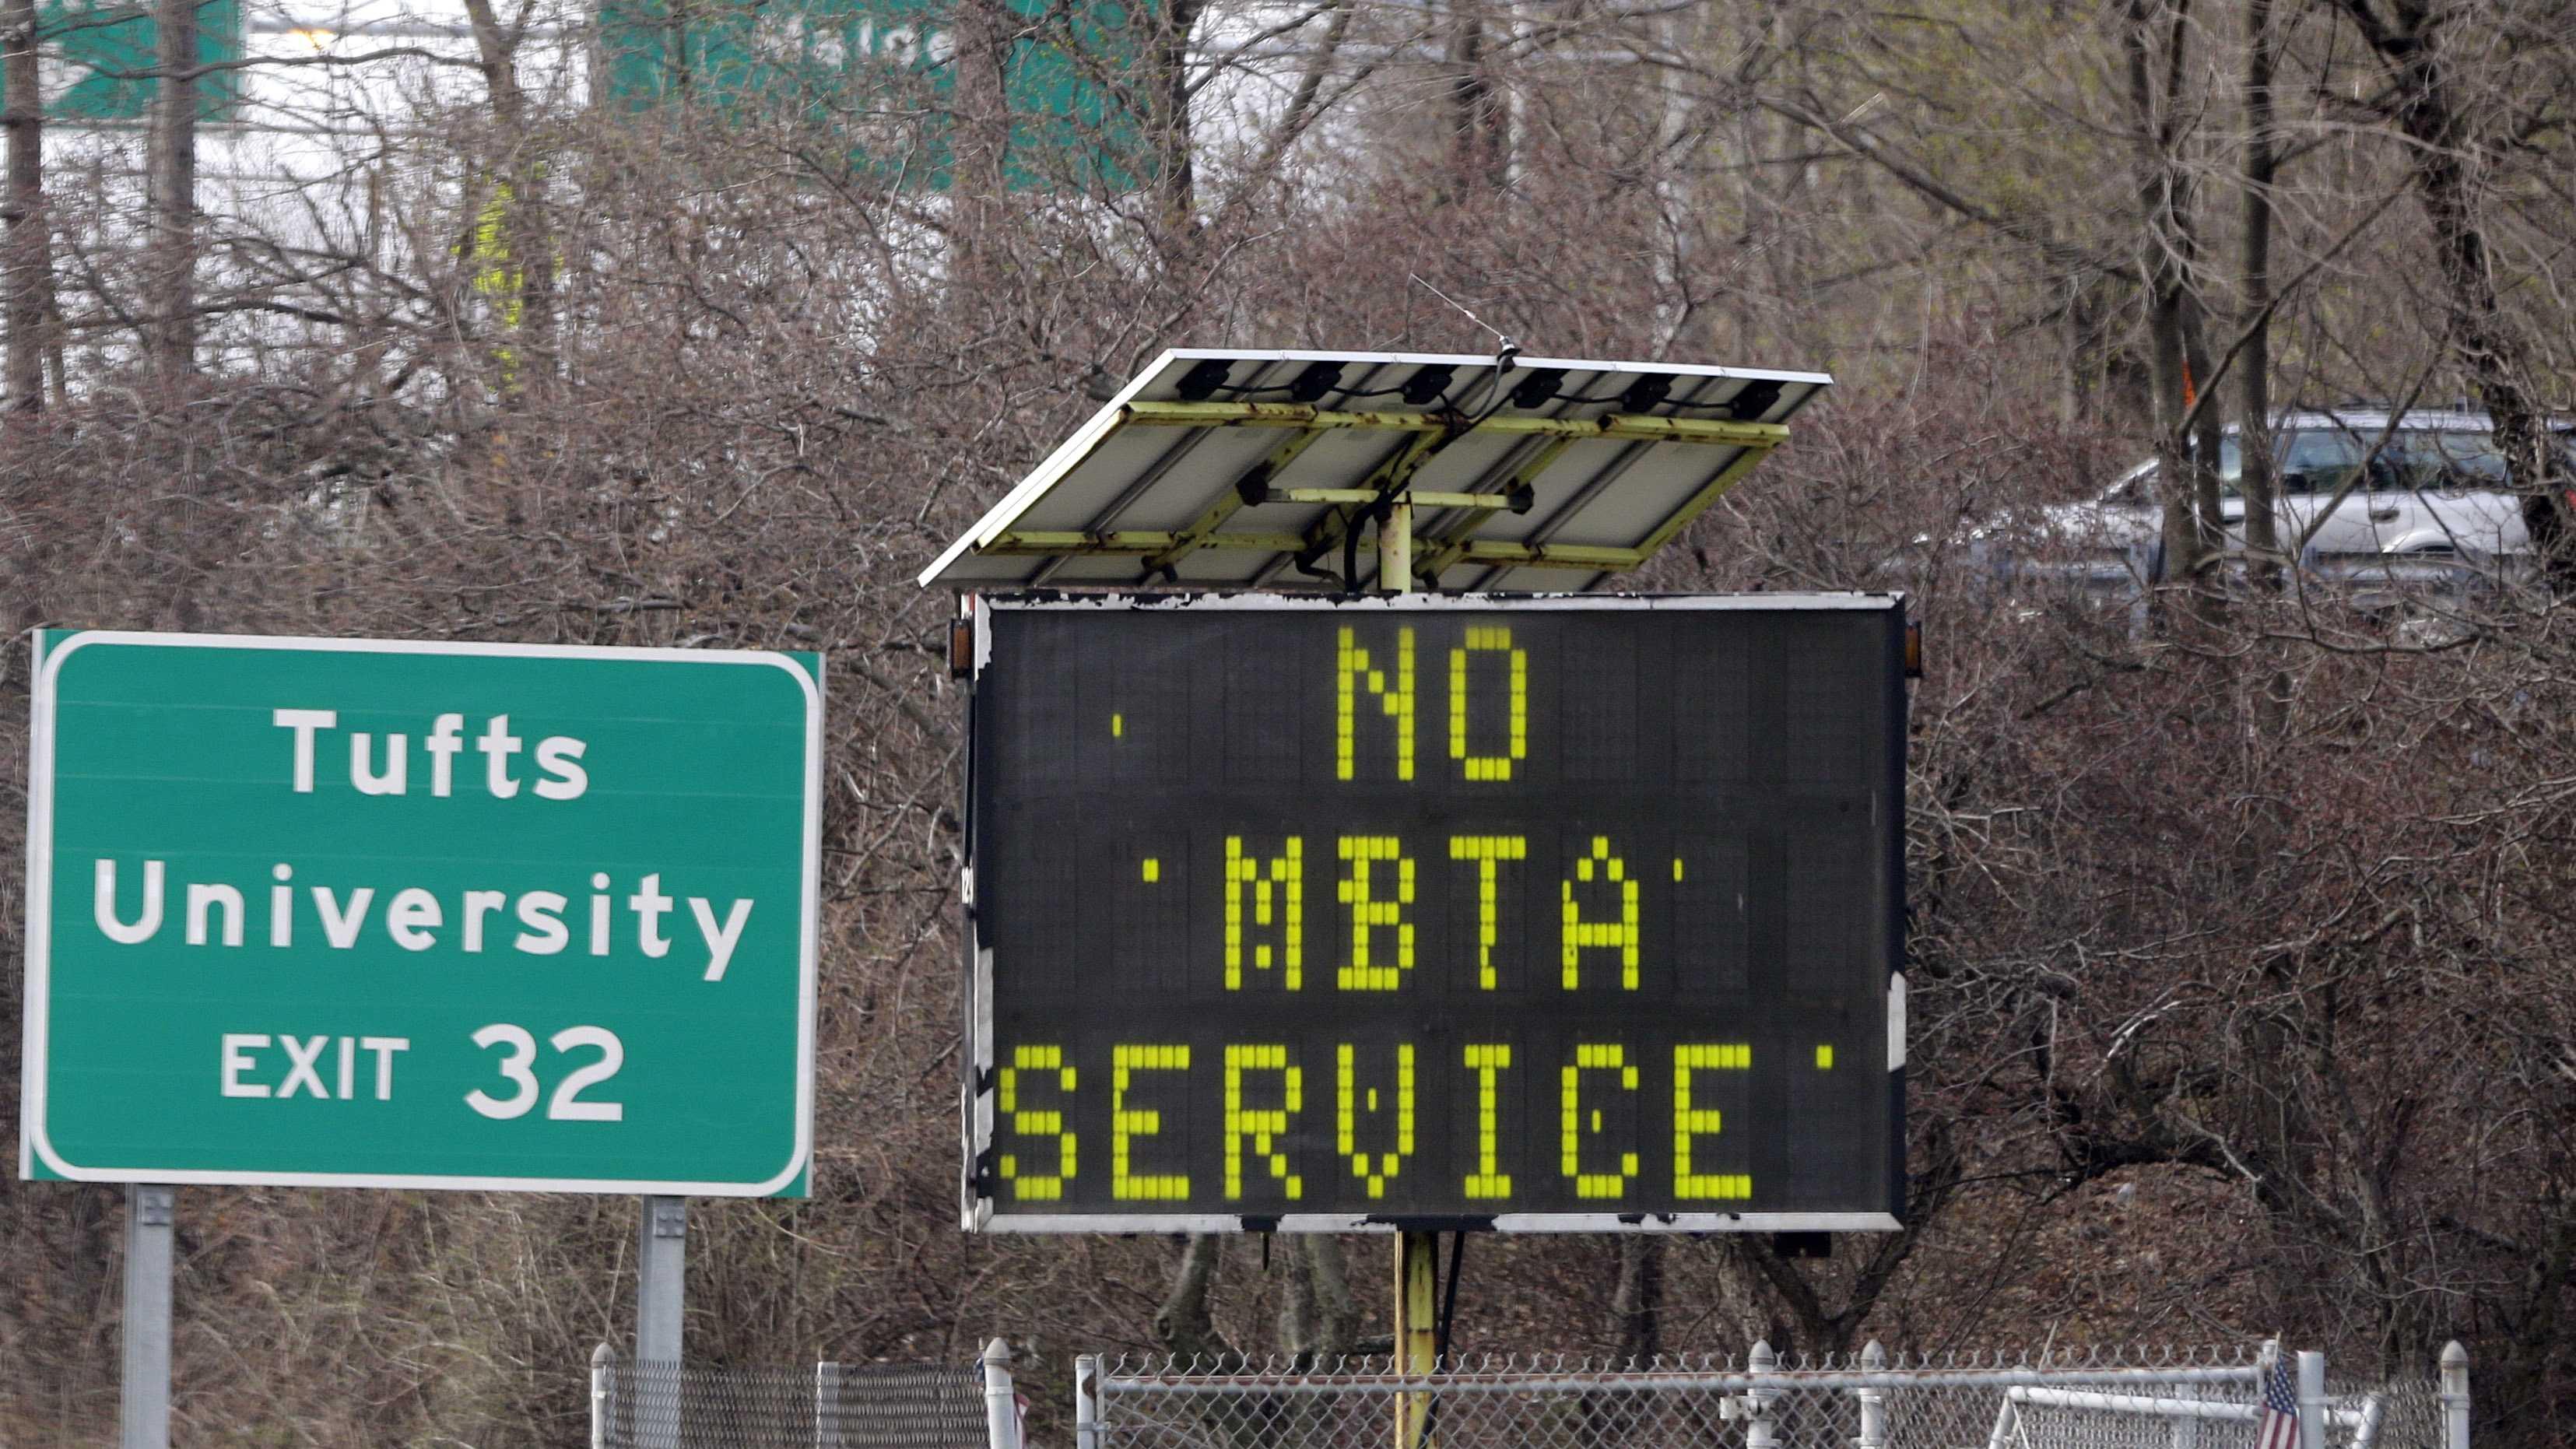 No MBTA Service Sign